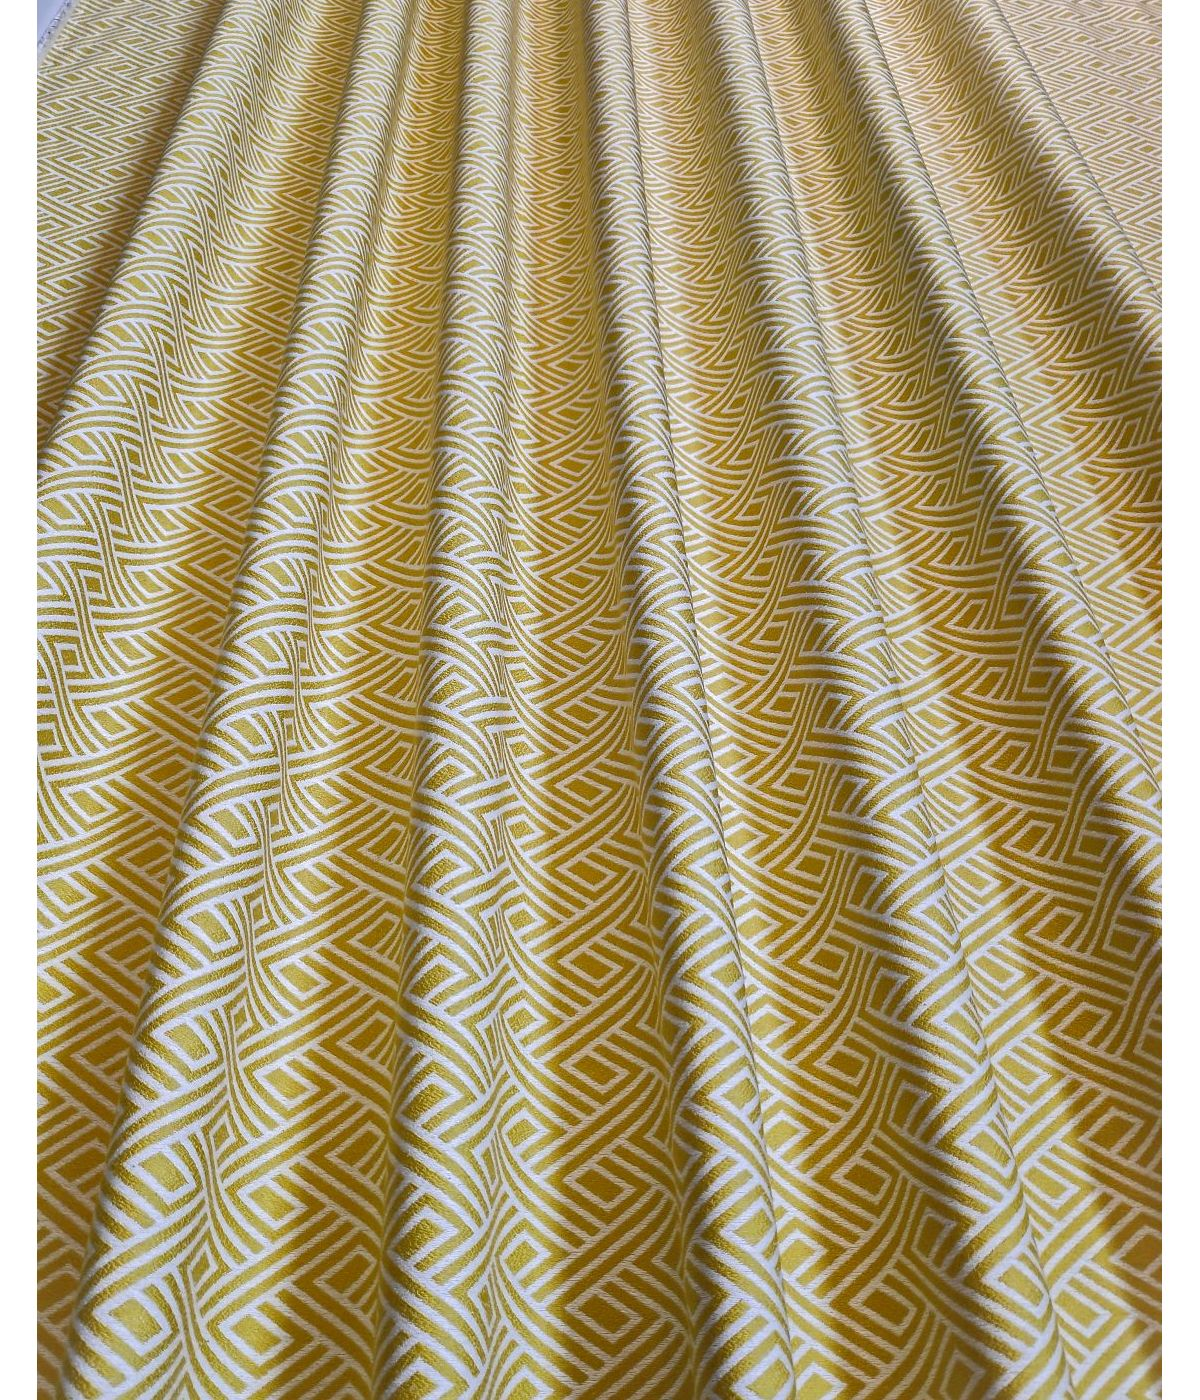 draperii galbena cu model simetric Tirreno